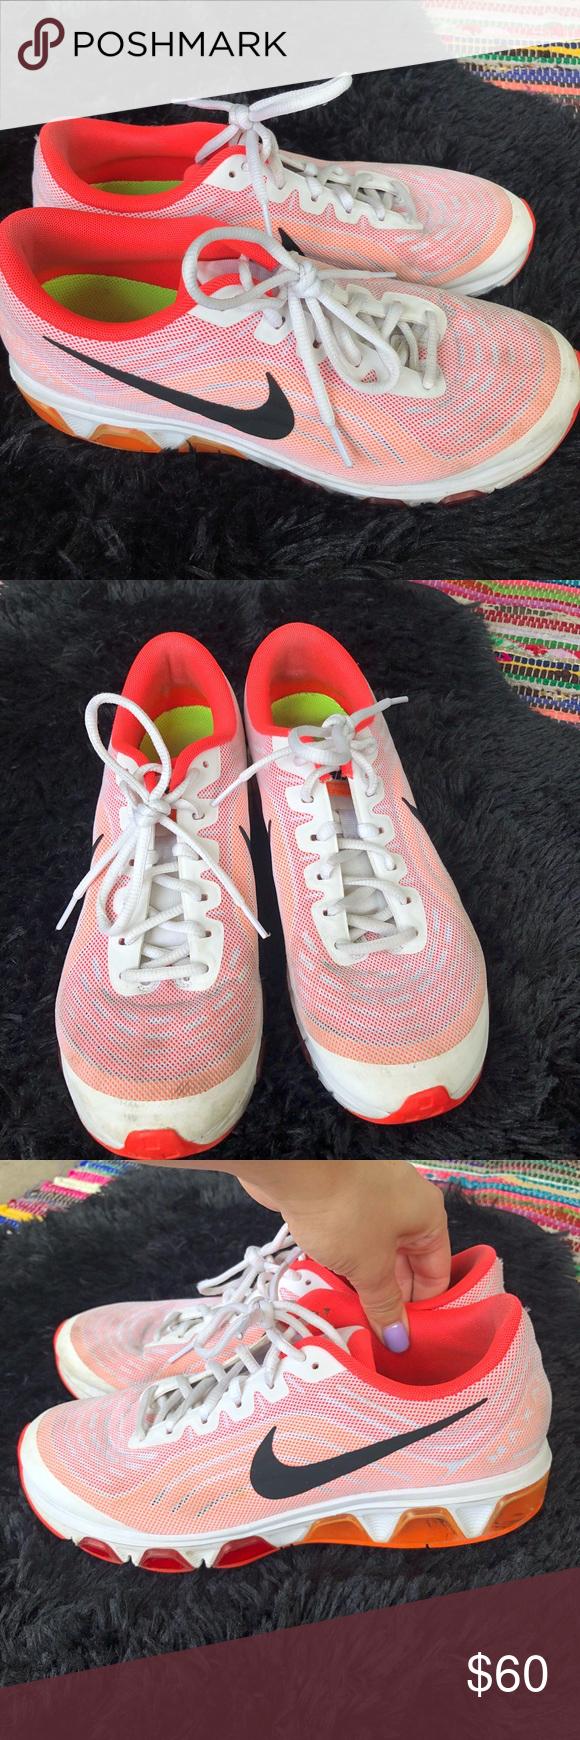 Nike max air waffle skin orange and pink sneakers Nike max